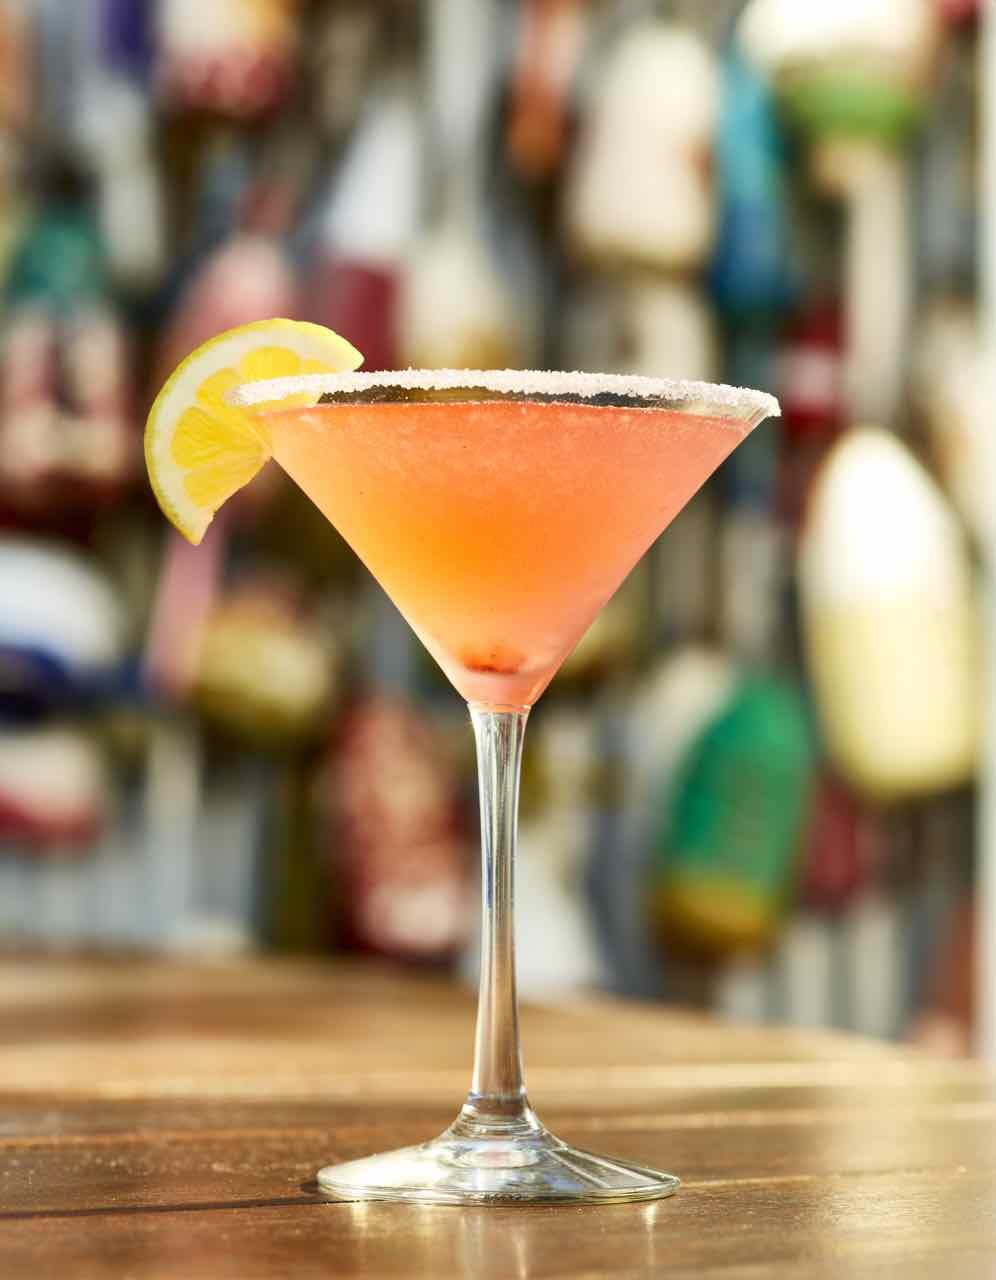 Raspberry-Lemon-Drop-Martini_190103_192827.jpg#asset:32470